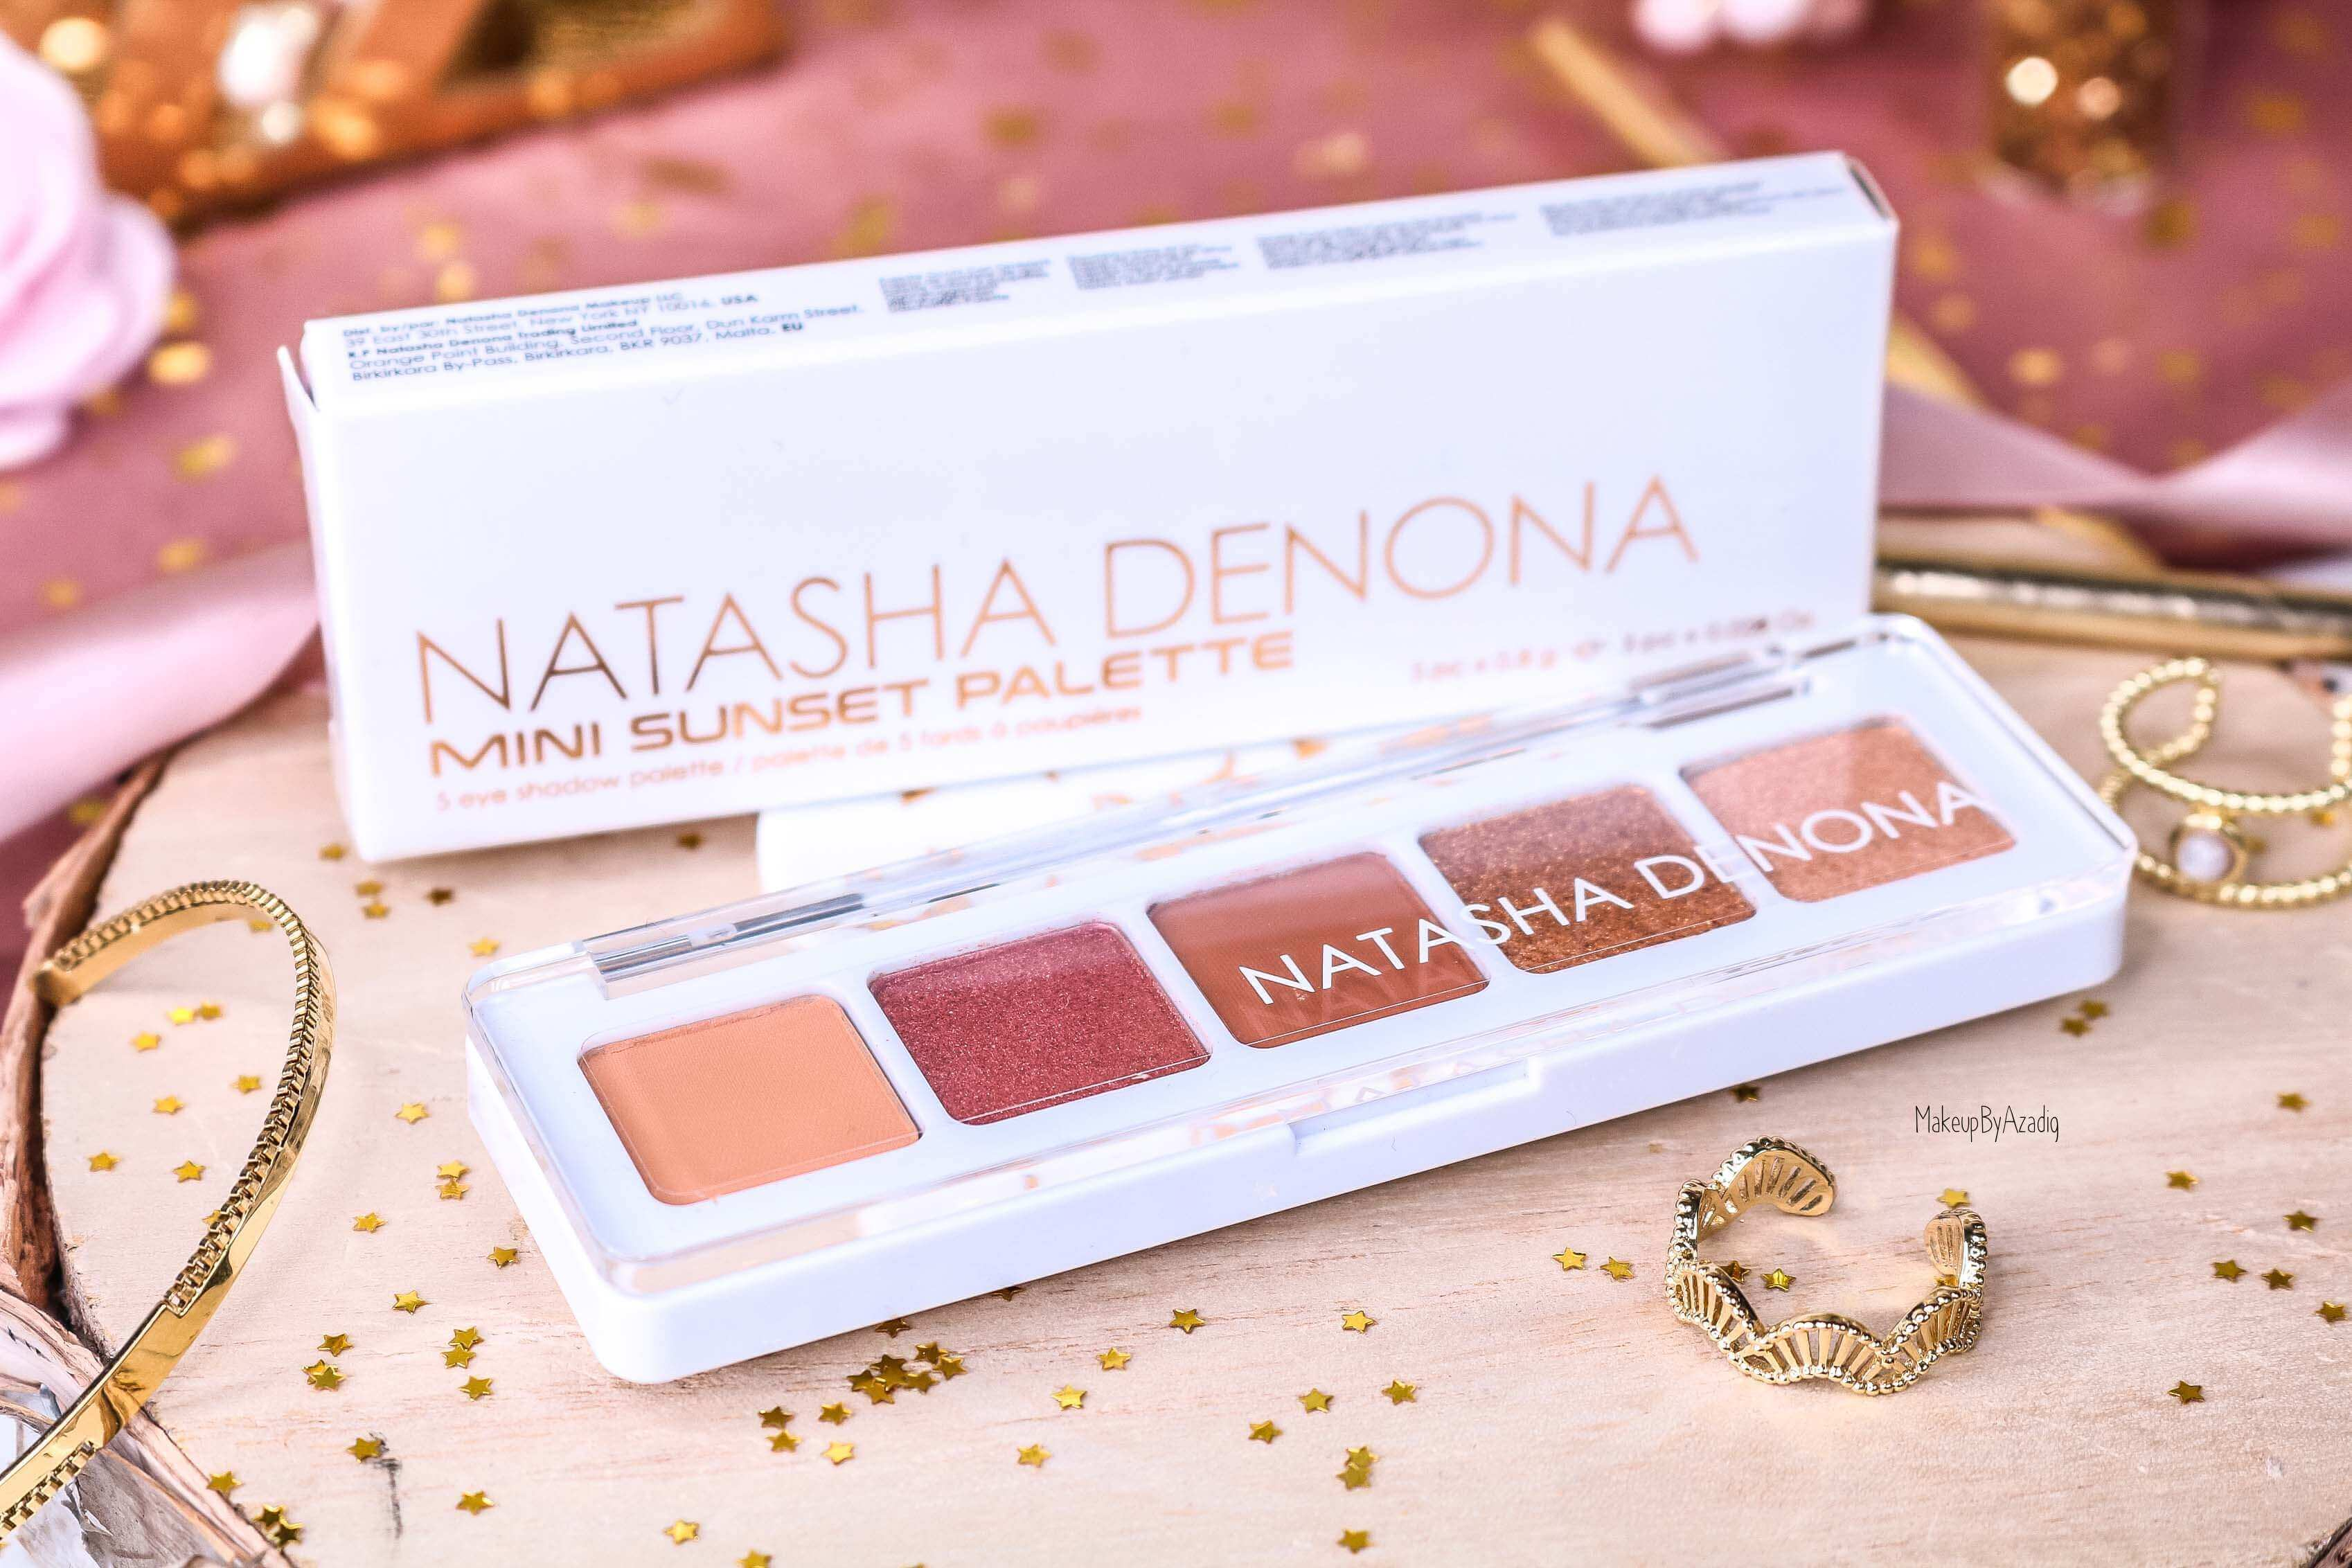 revue-palette-mini-sunset-natasha-denona-sephora-france-avis-prix-swatch-gold-champagne-burgundy-makeupbyazadig-eyeshadow-white